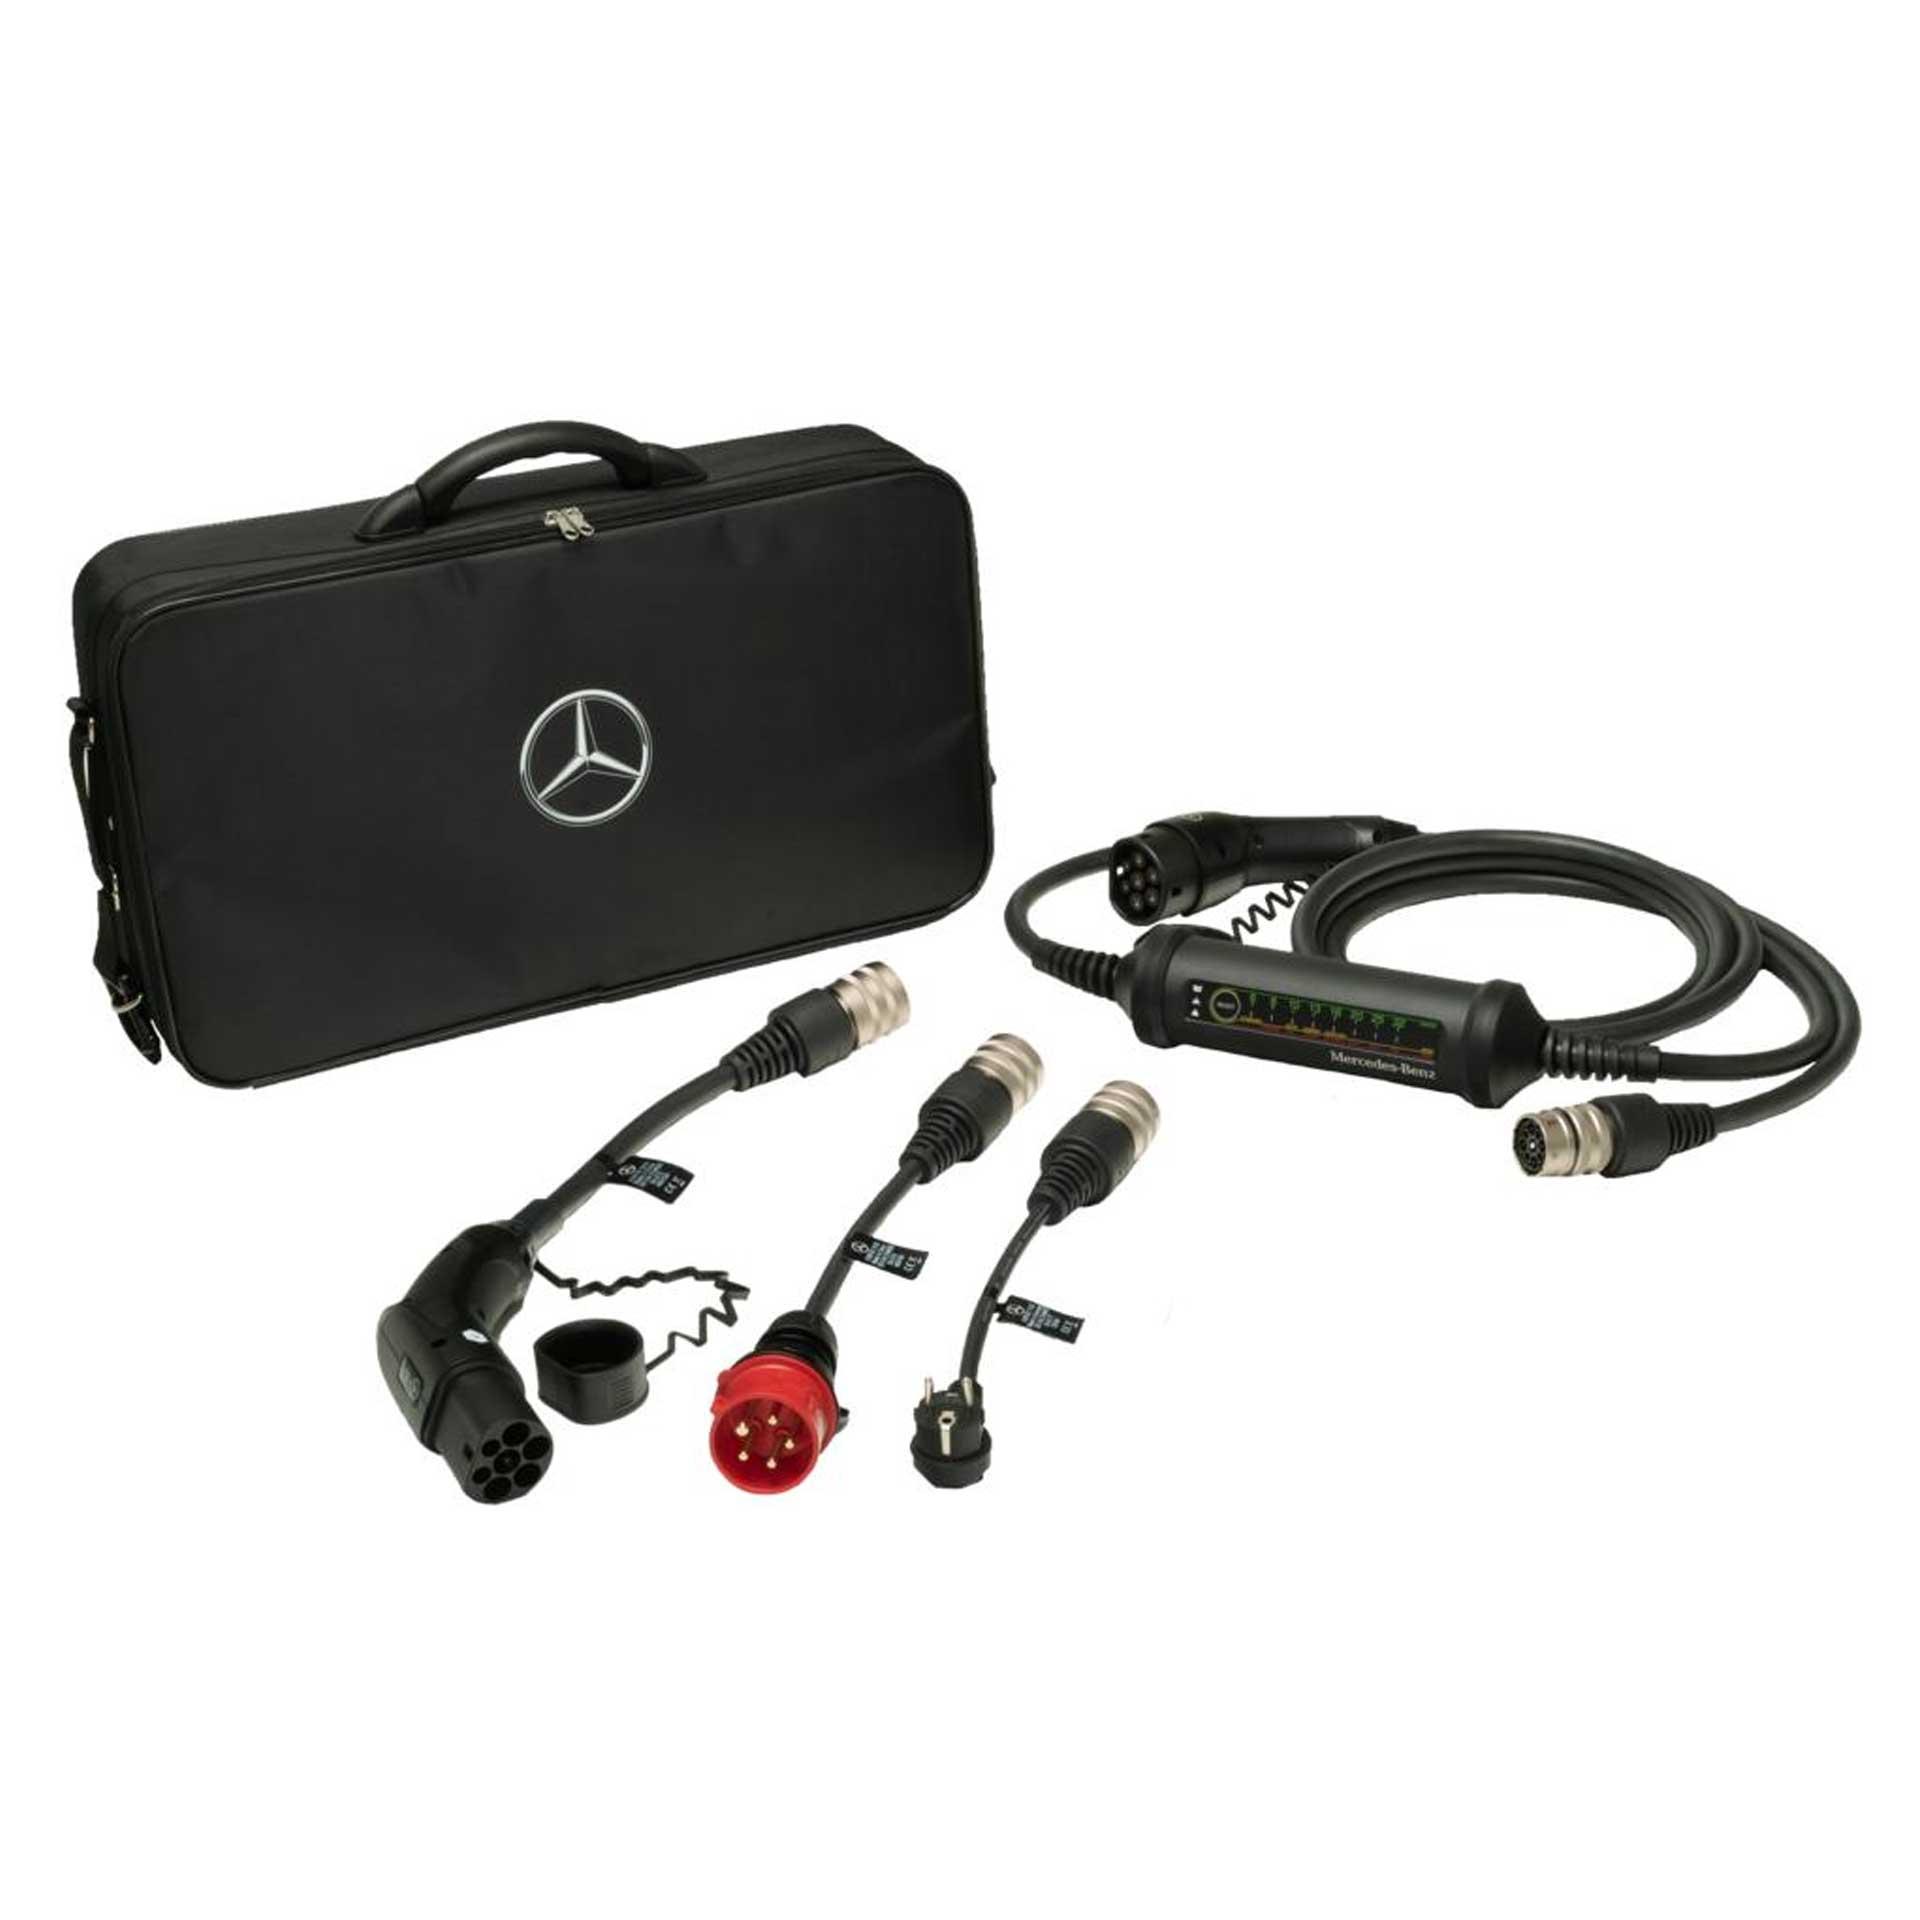 Mercedes-Benz flexibles Ladesystem 32/3-phasig 5-teilig